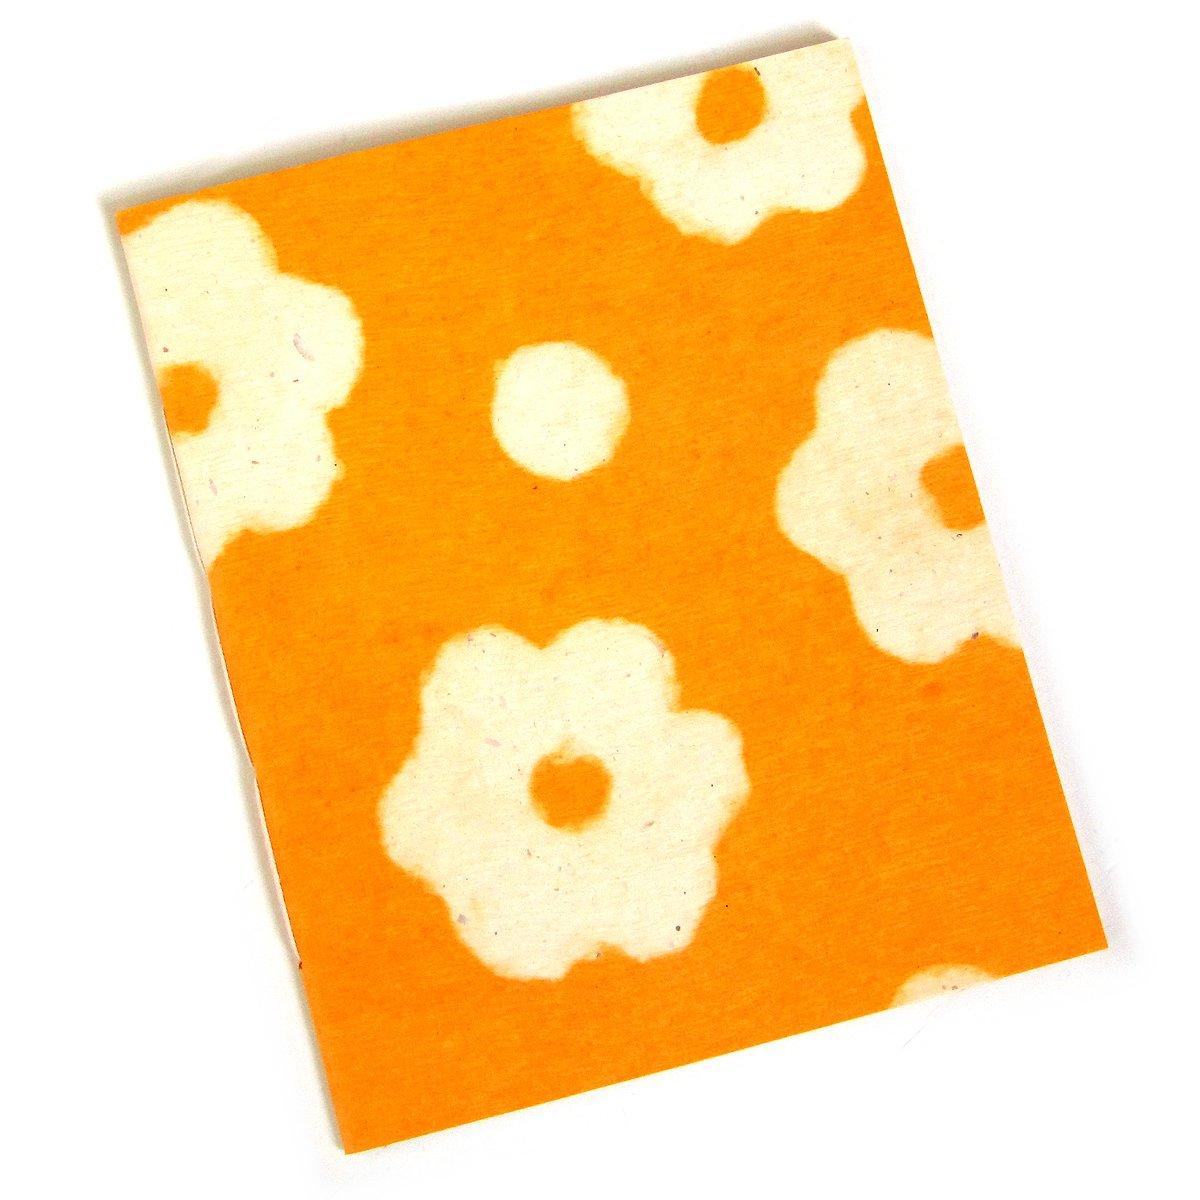 Sketching scrapbook handmade flower recycled paper yellow 7x8 20pp journal notebook mom present